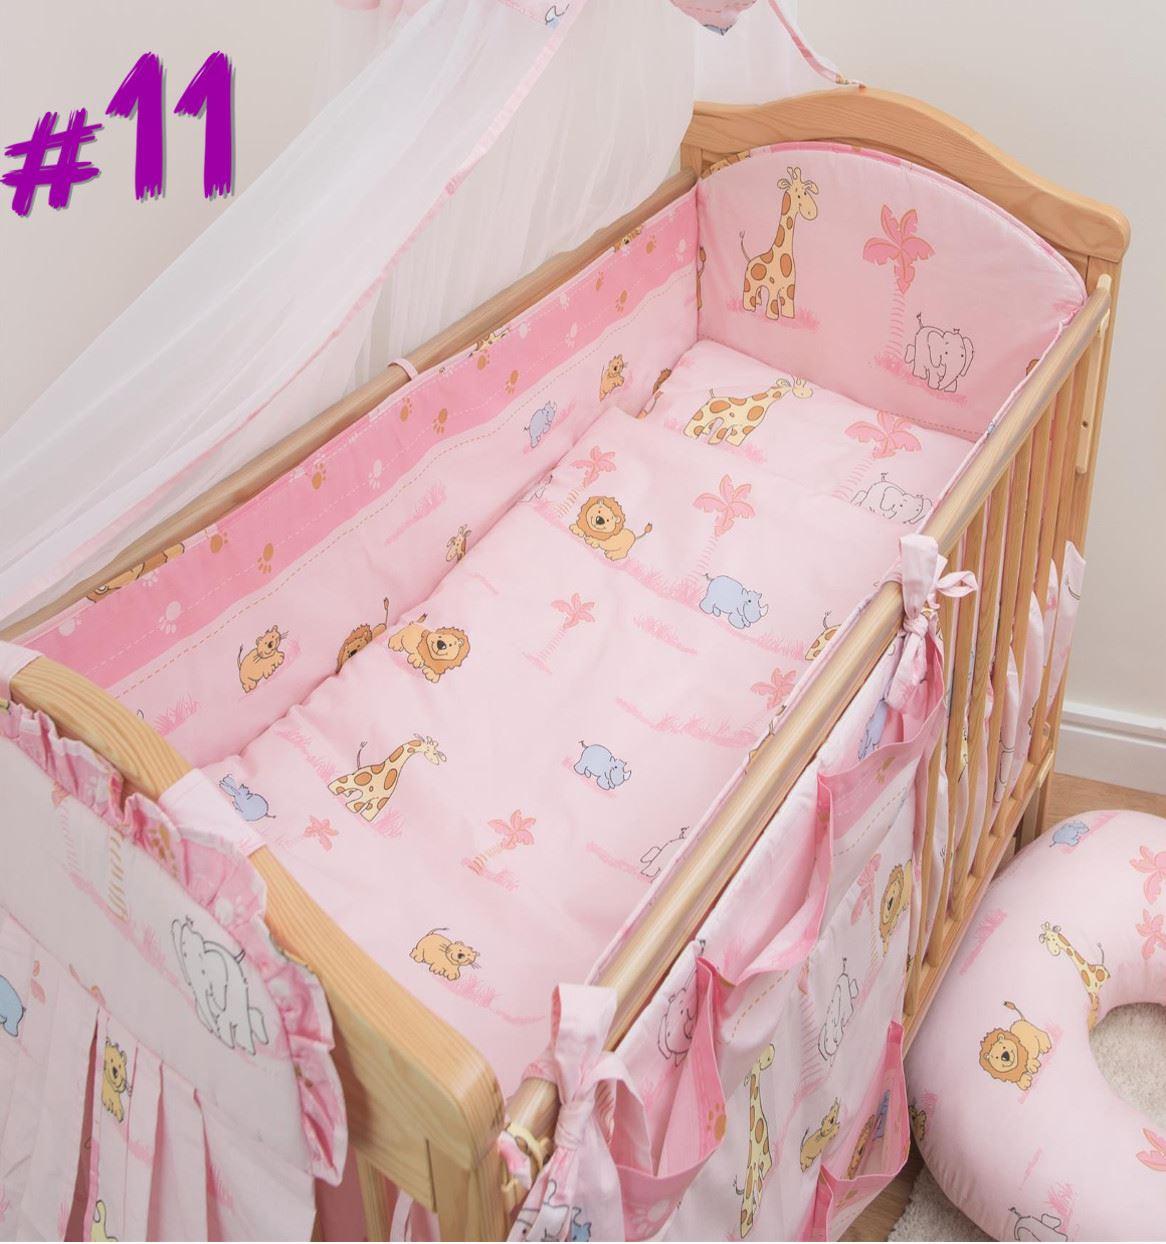 lang rundherum gitterbett nestchen gr en passend f r baby kinderzimmer ebay. Black Bedroom Furniture Sets. Home Design Ideas